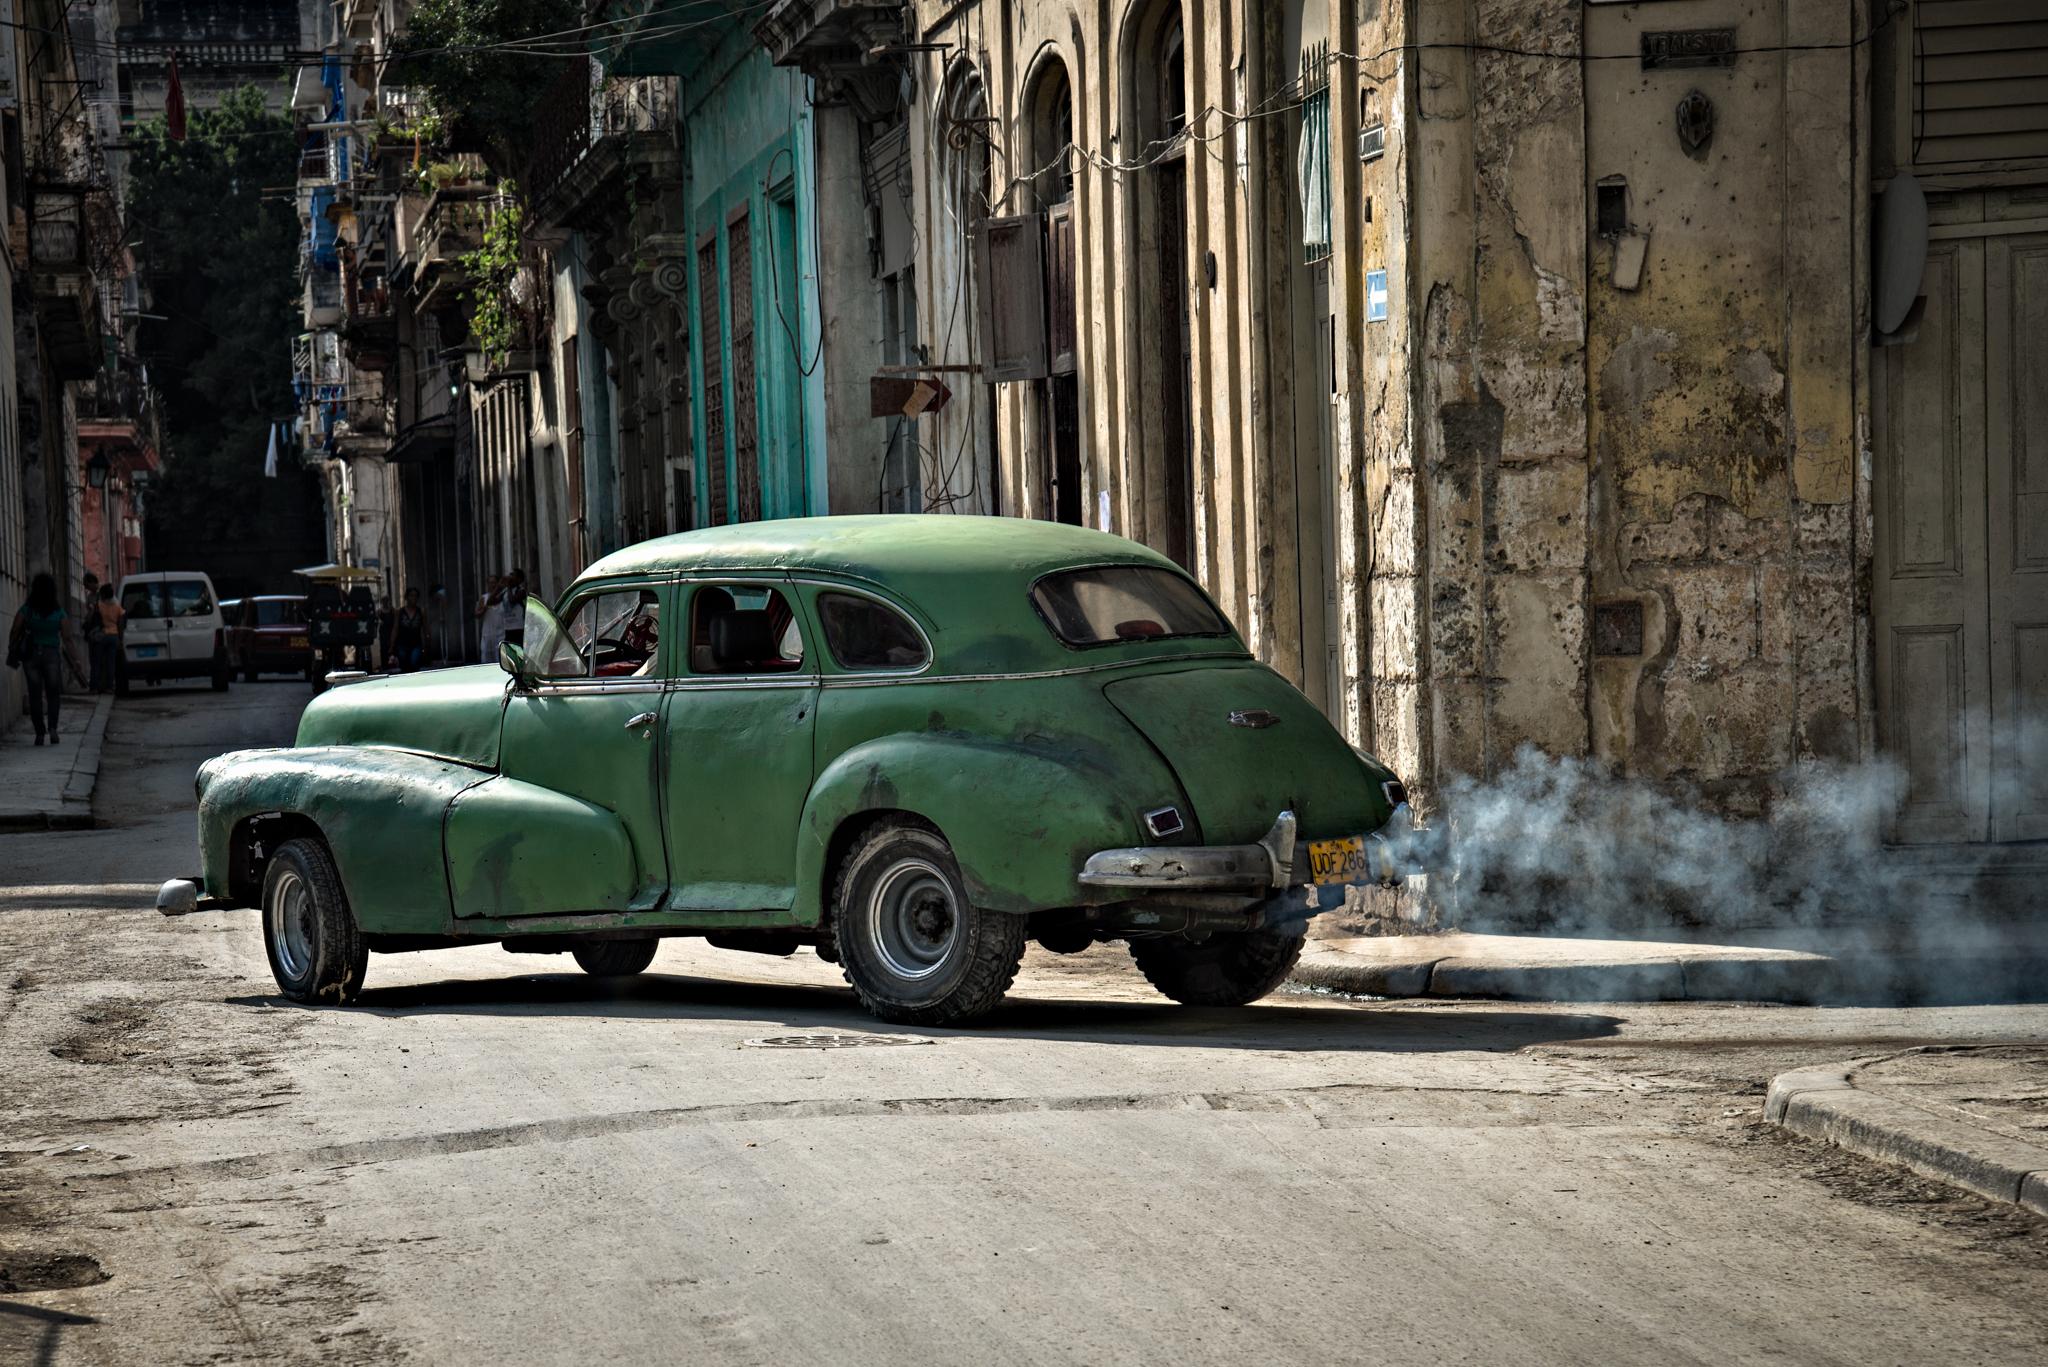 Turn the Corner - Havana - 2013